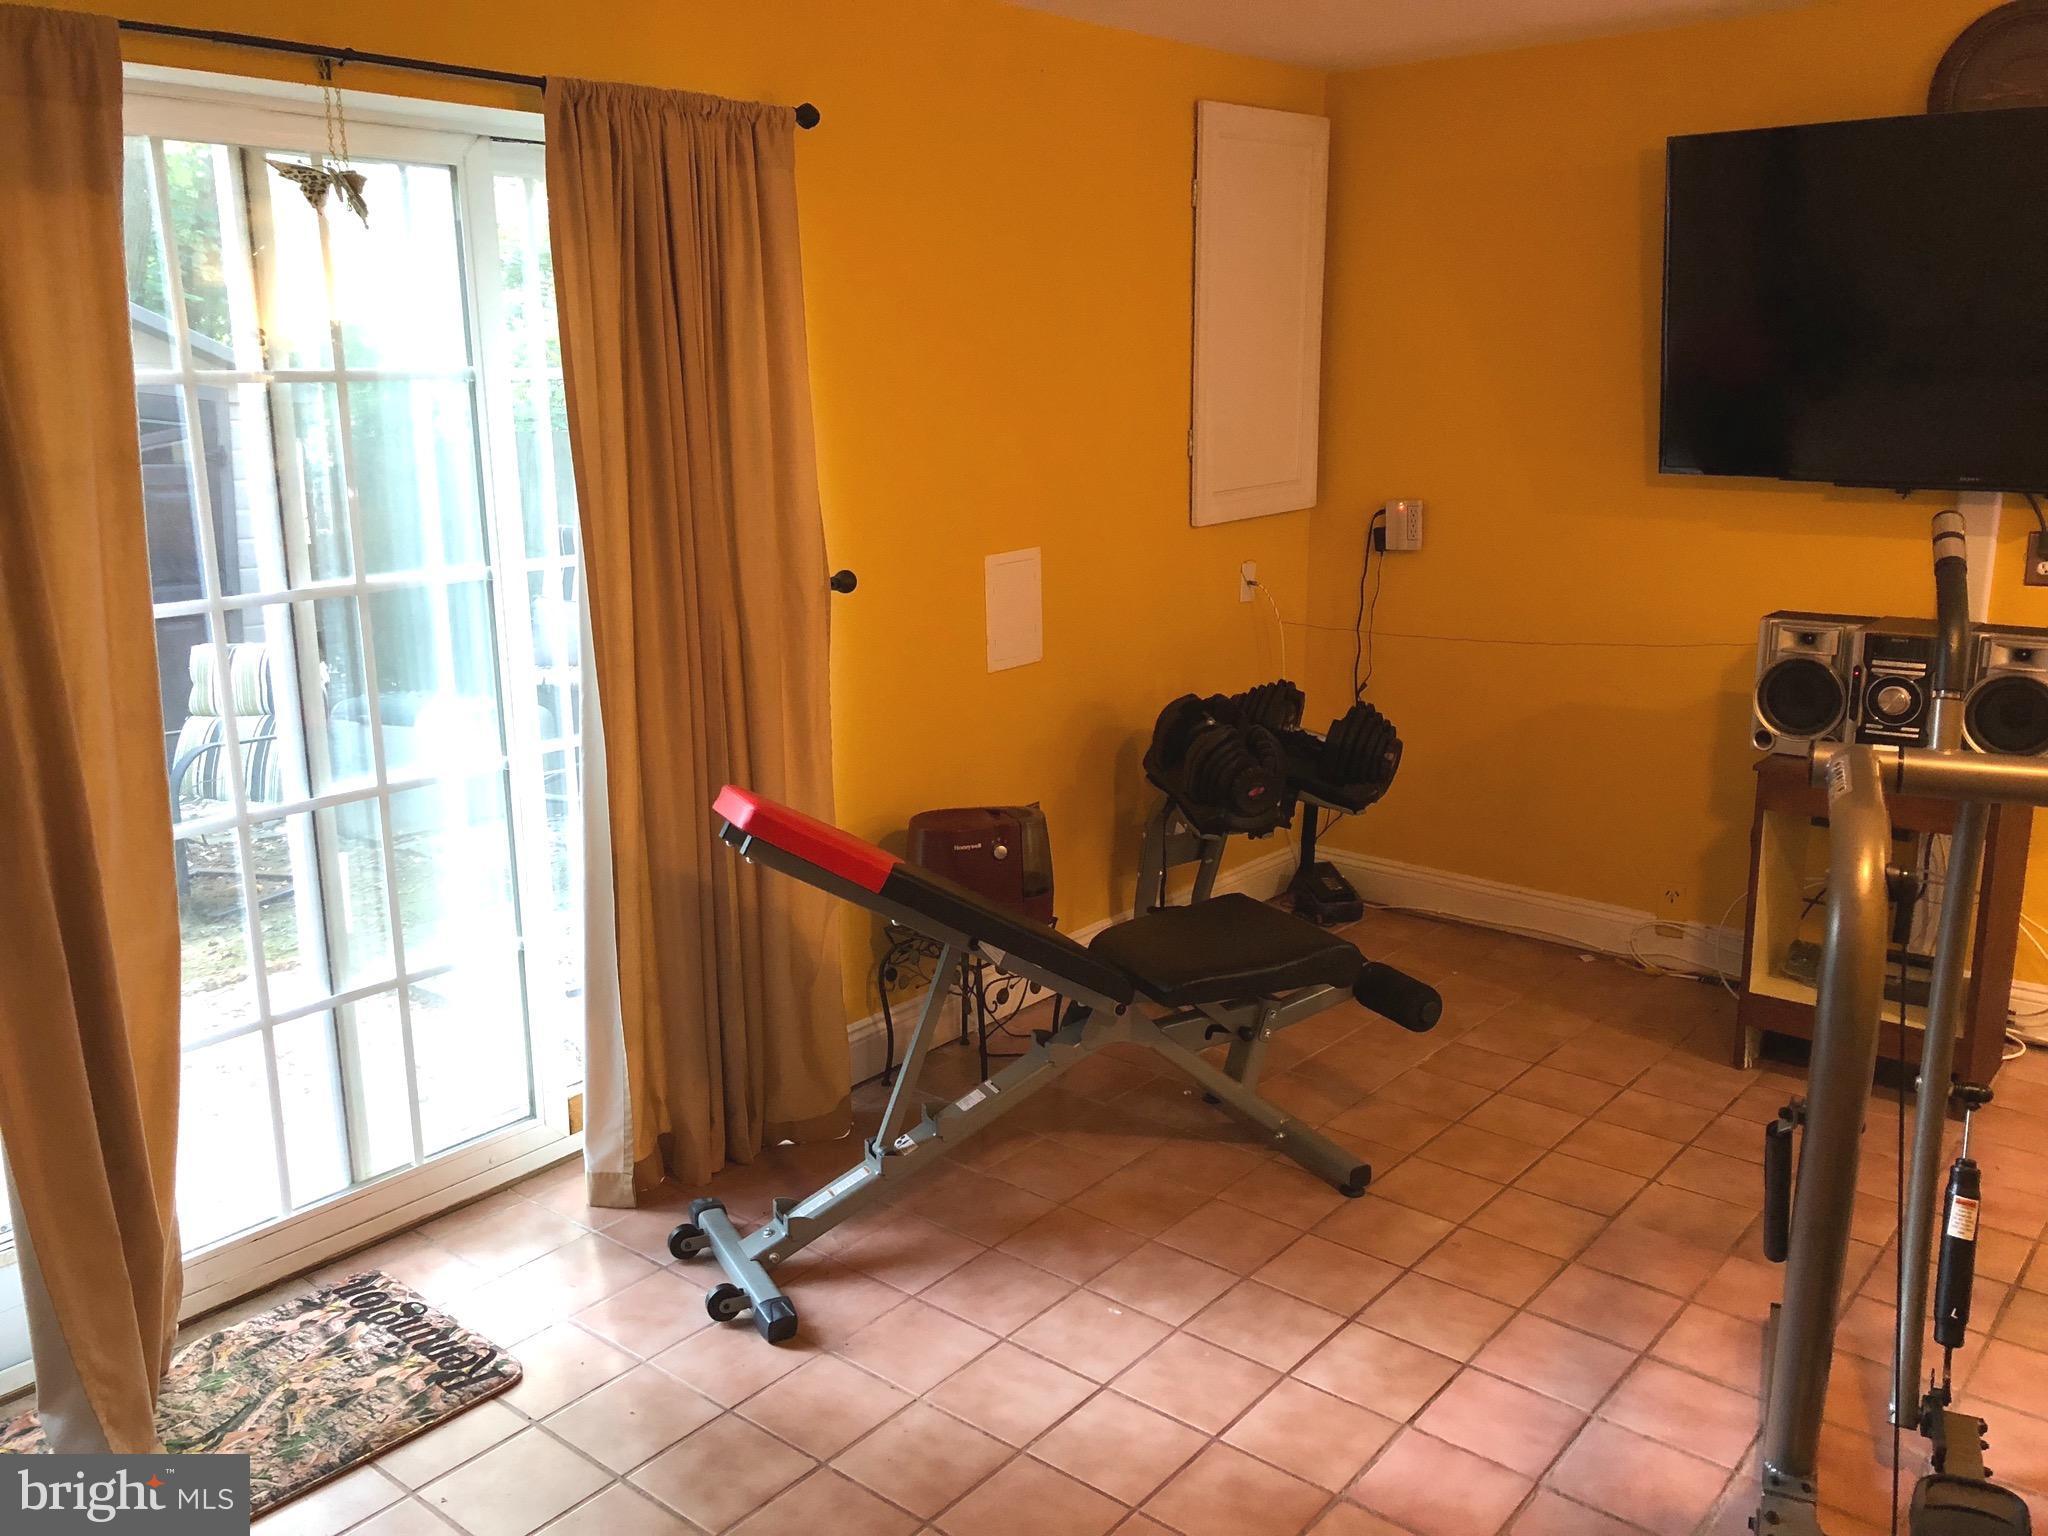 47 WAYSIDE COURT, Stafford, VA 22554 | RE/MAX Gateway